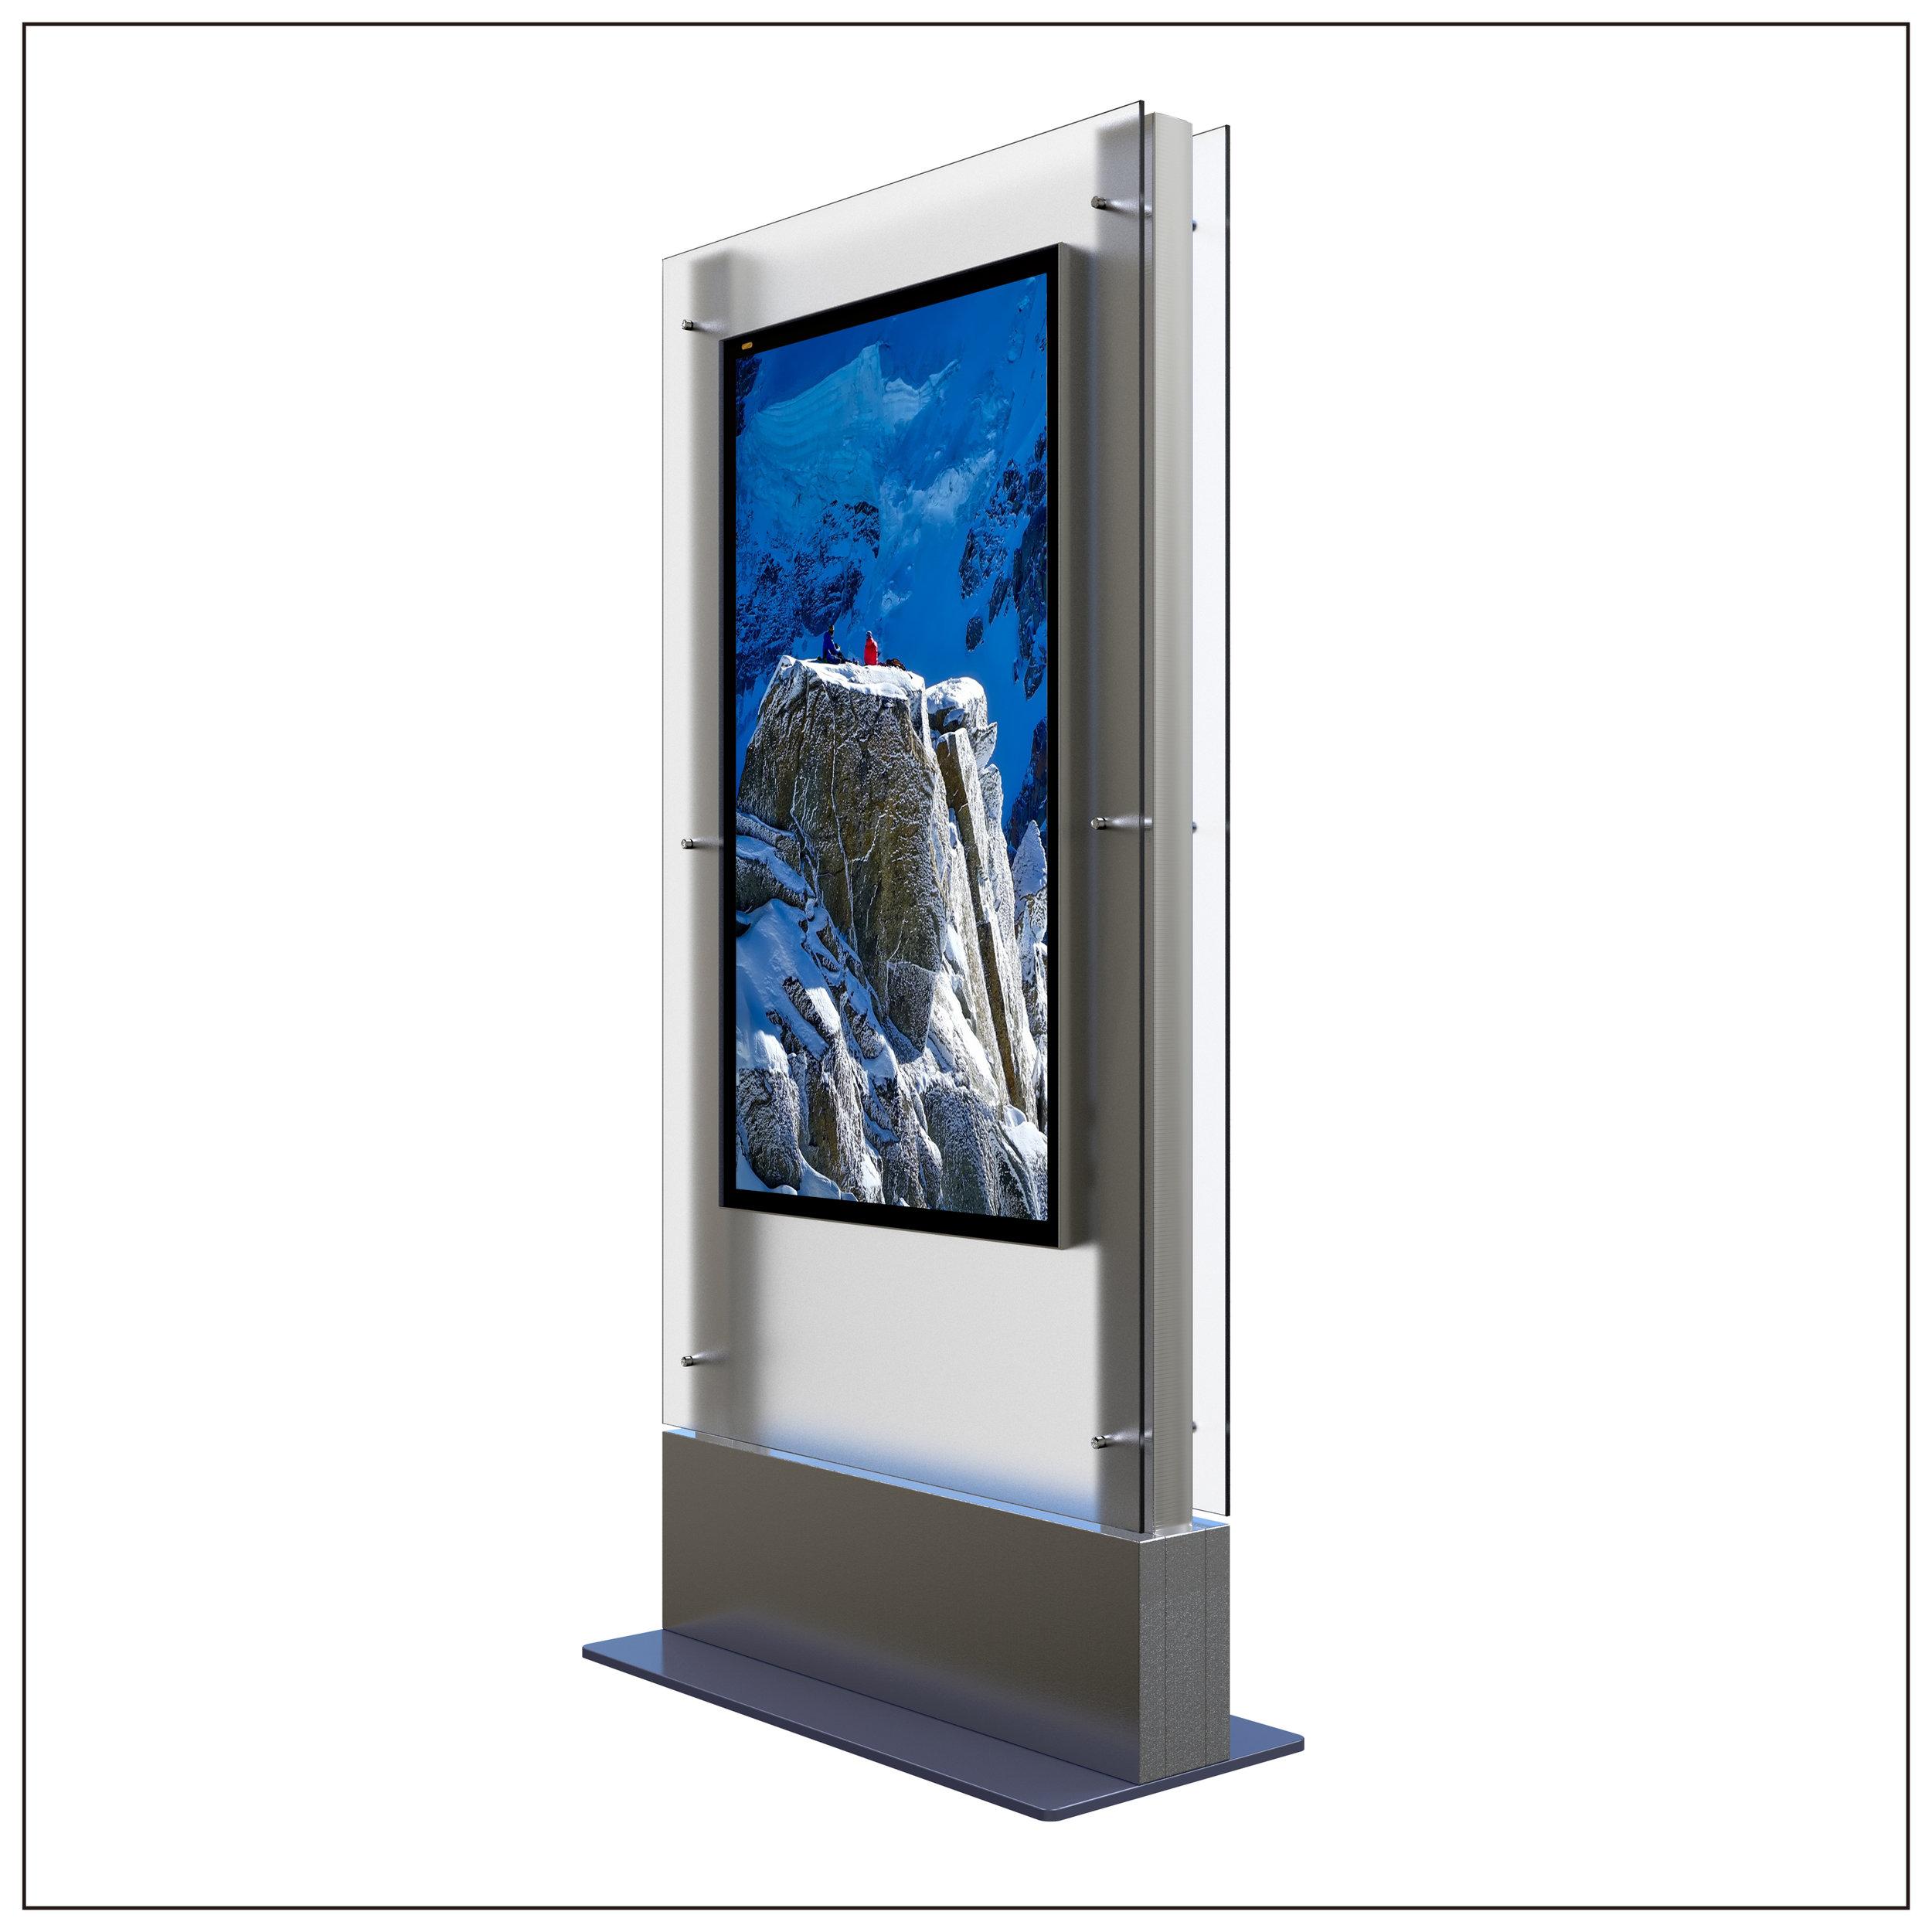 High Brightness LCD Display